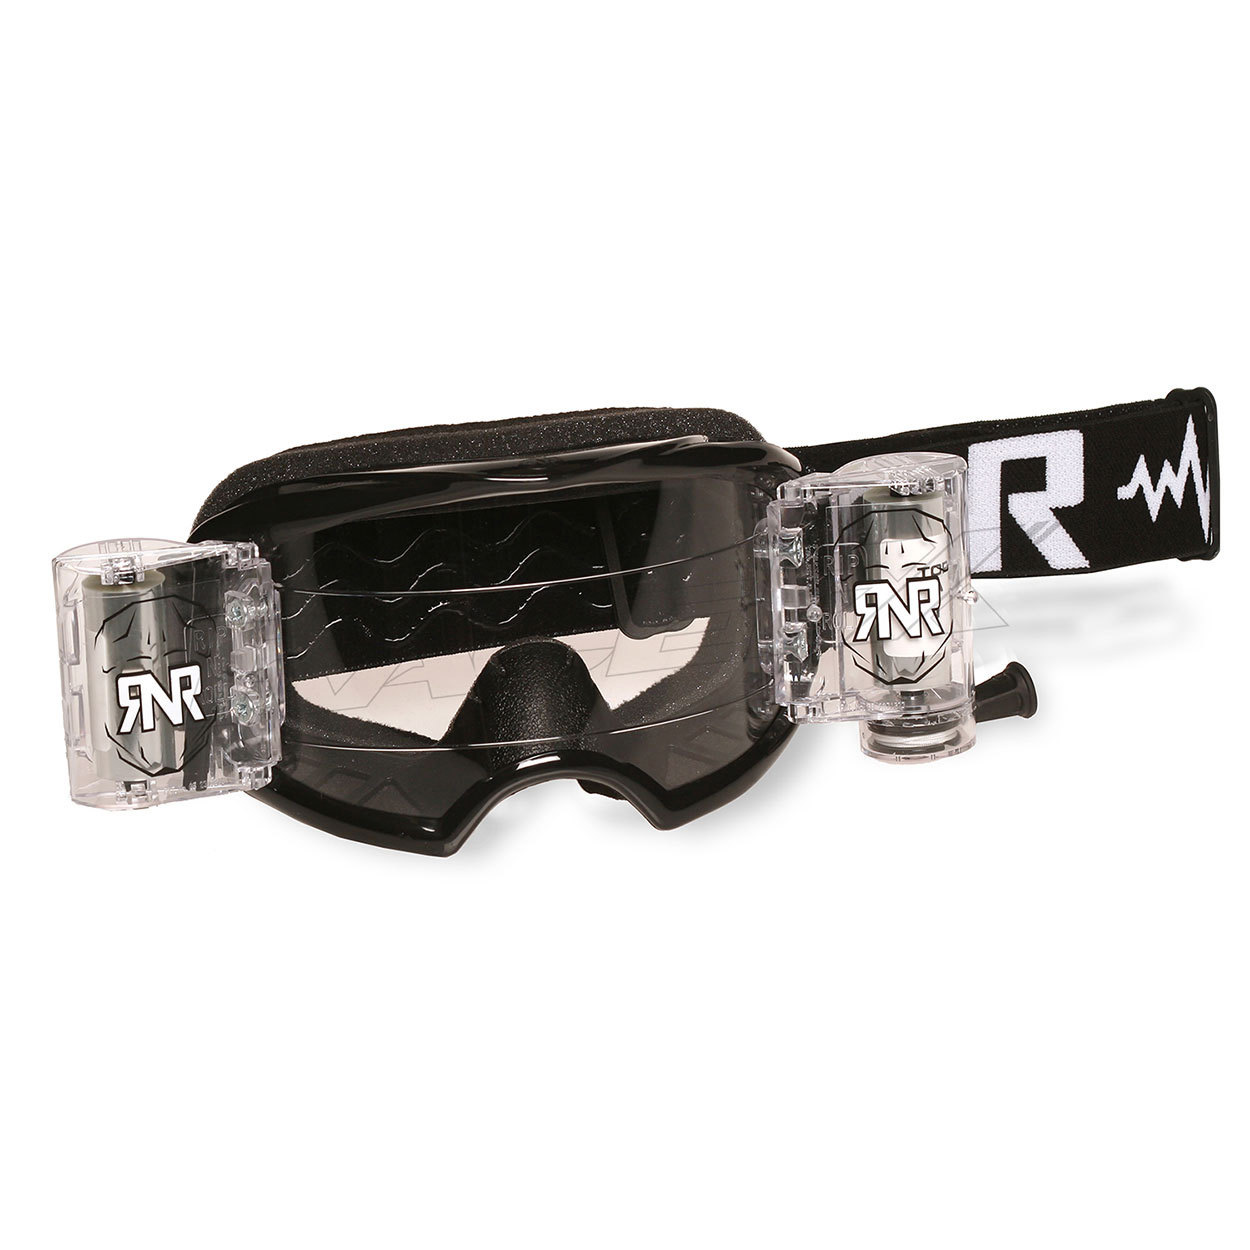 RNR Crossbril WVS Racerpack Colossus 50MM - Zwart